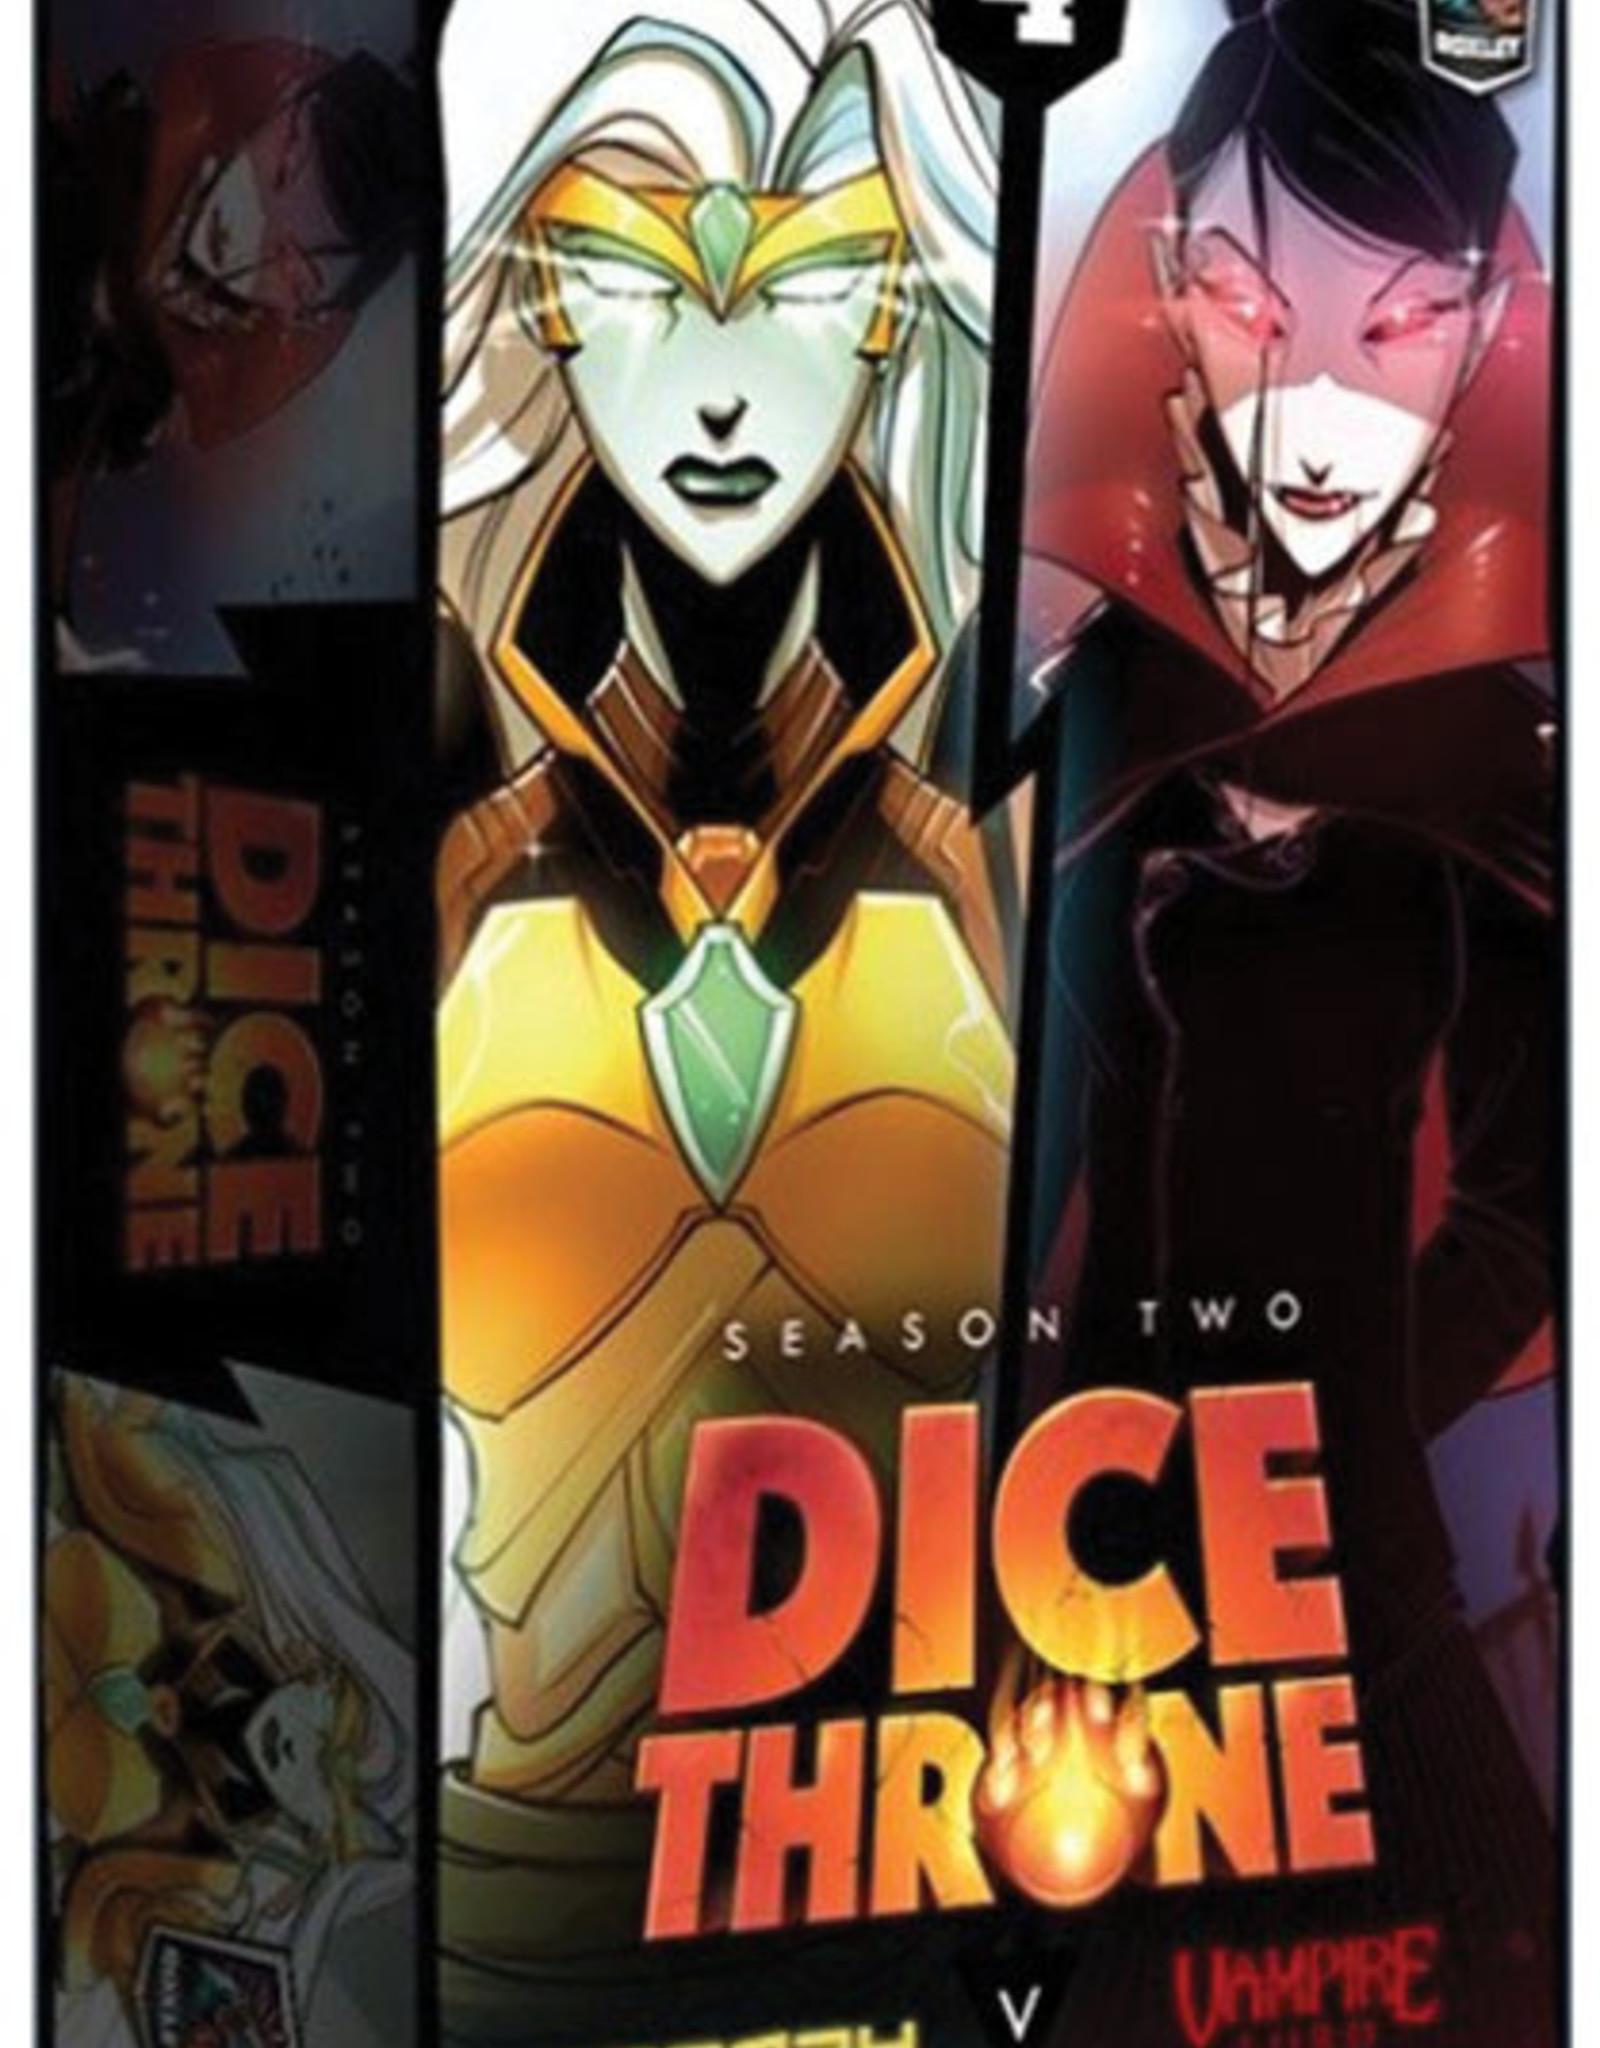 roxley Dice Throne Season 2: Box 4